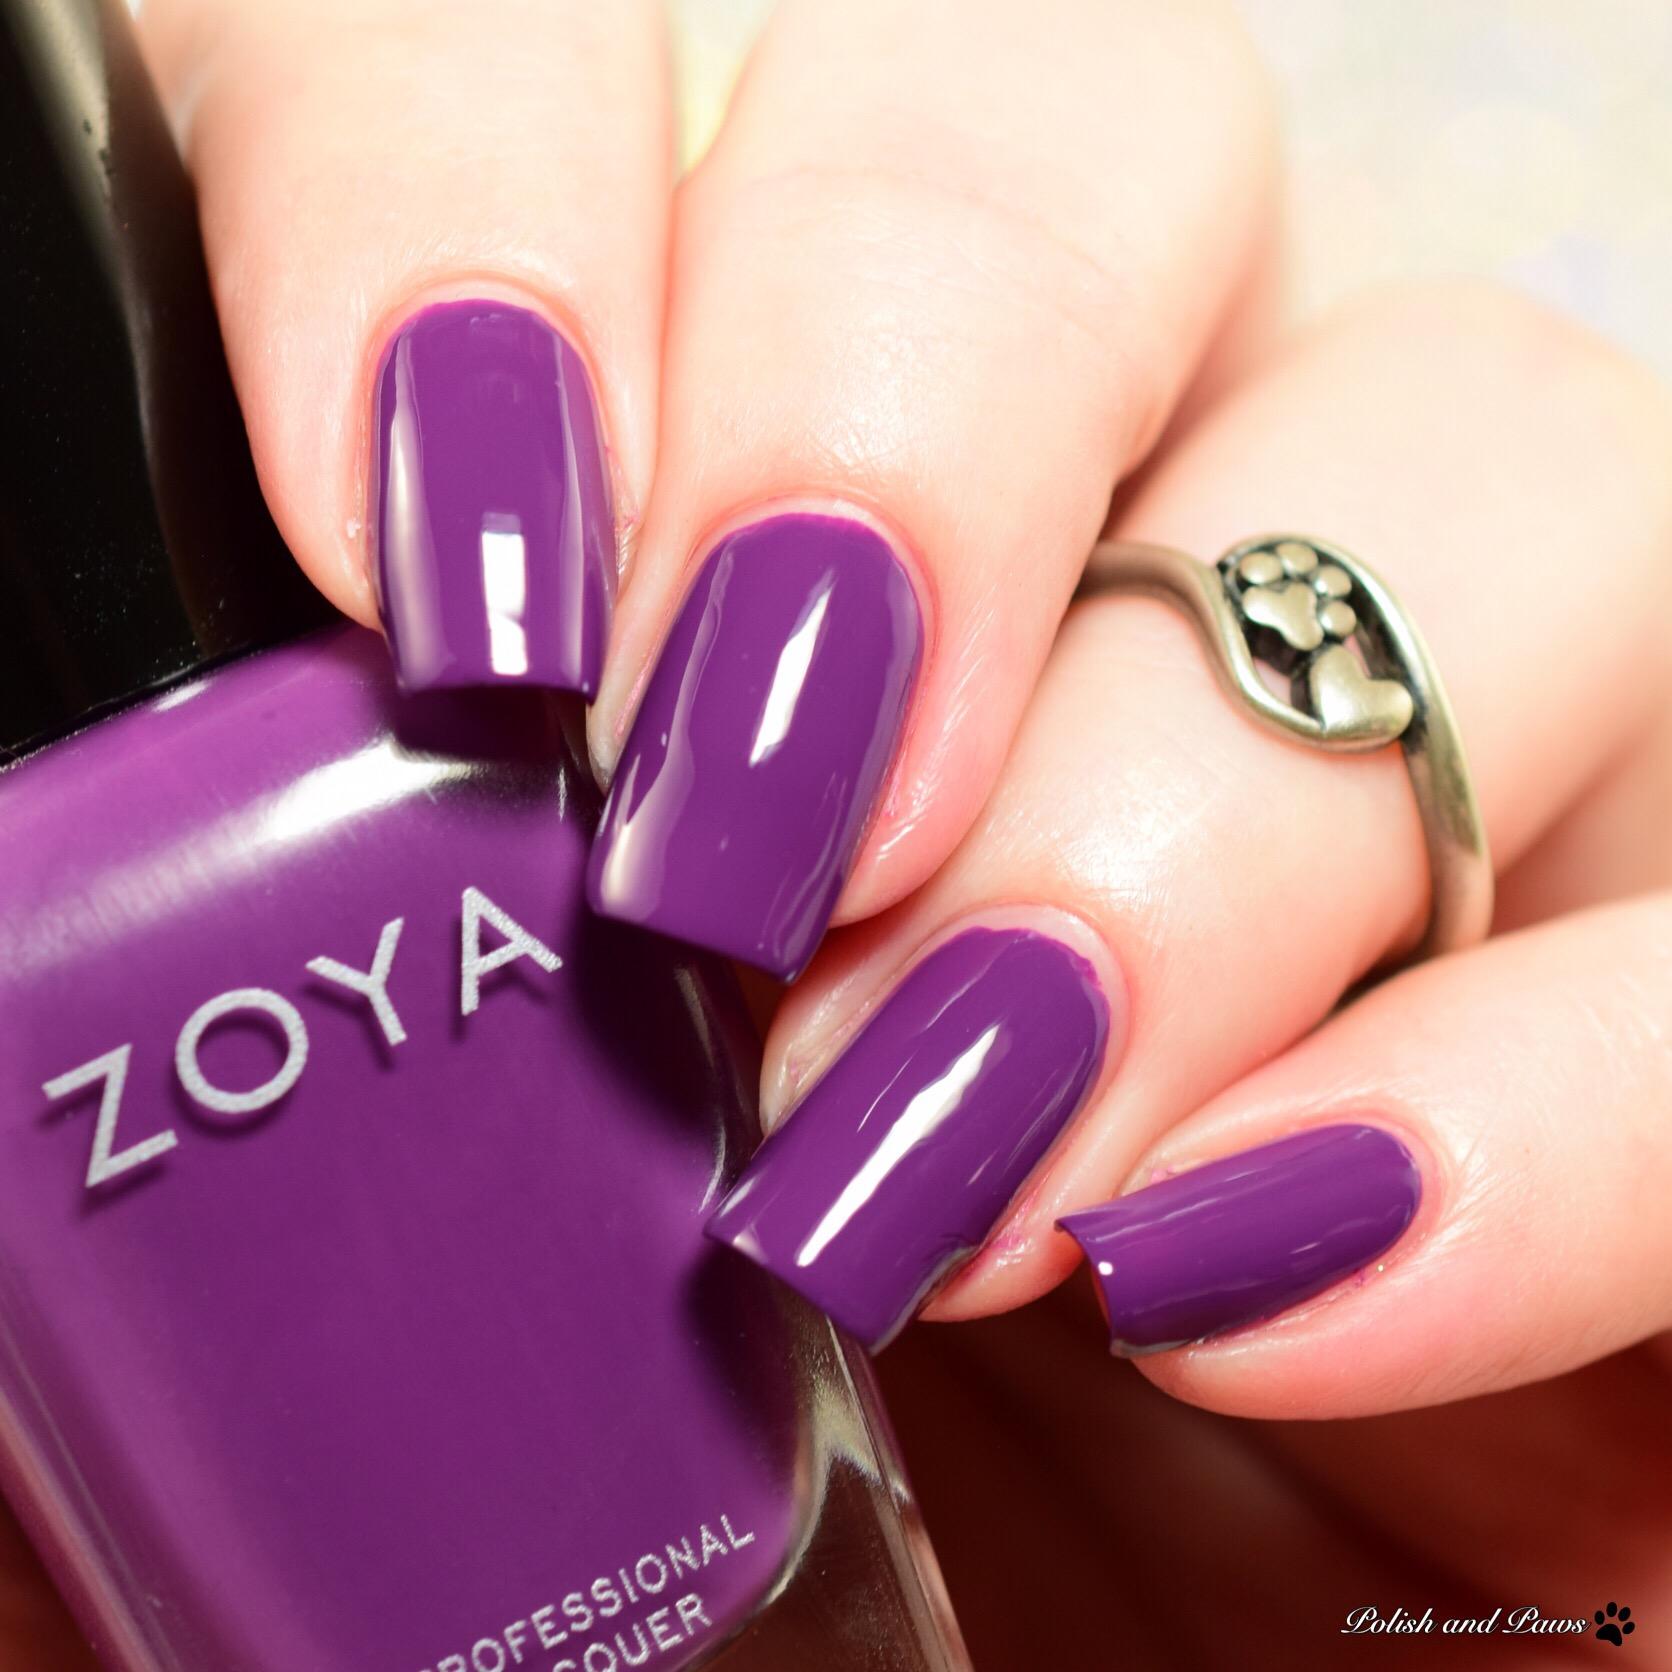 Zoya Landon